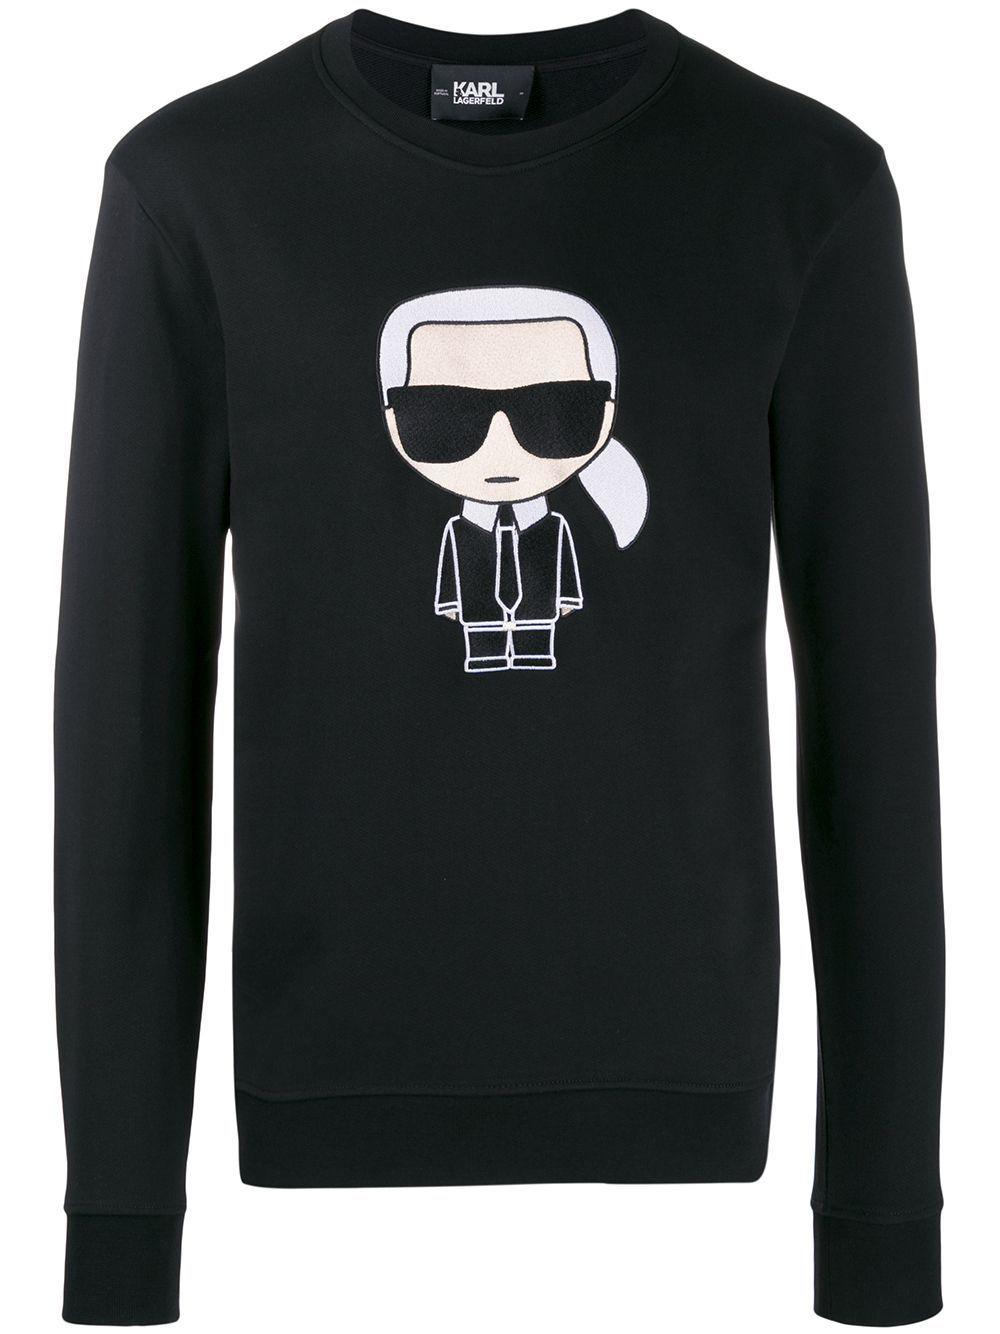 Karl Lagerfeld Ikonik Sweatshirt Farfetch Allwhiteclothes In 2020 Sweatshirts Simple Trendy Outfits Karl Lagerfeld